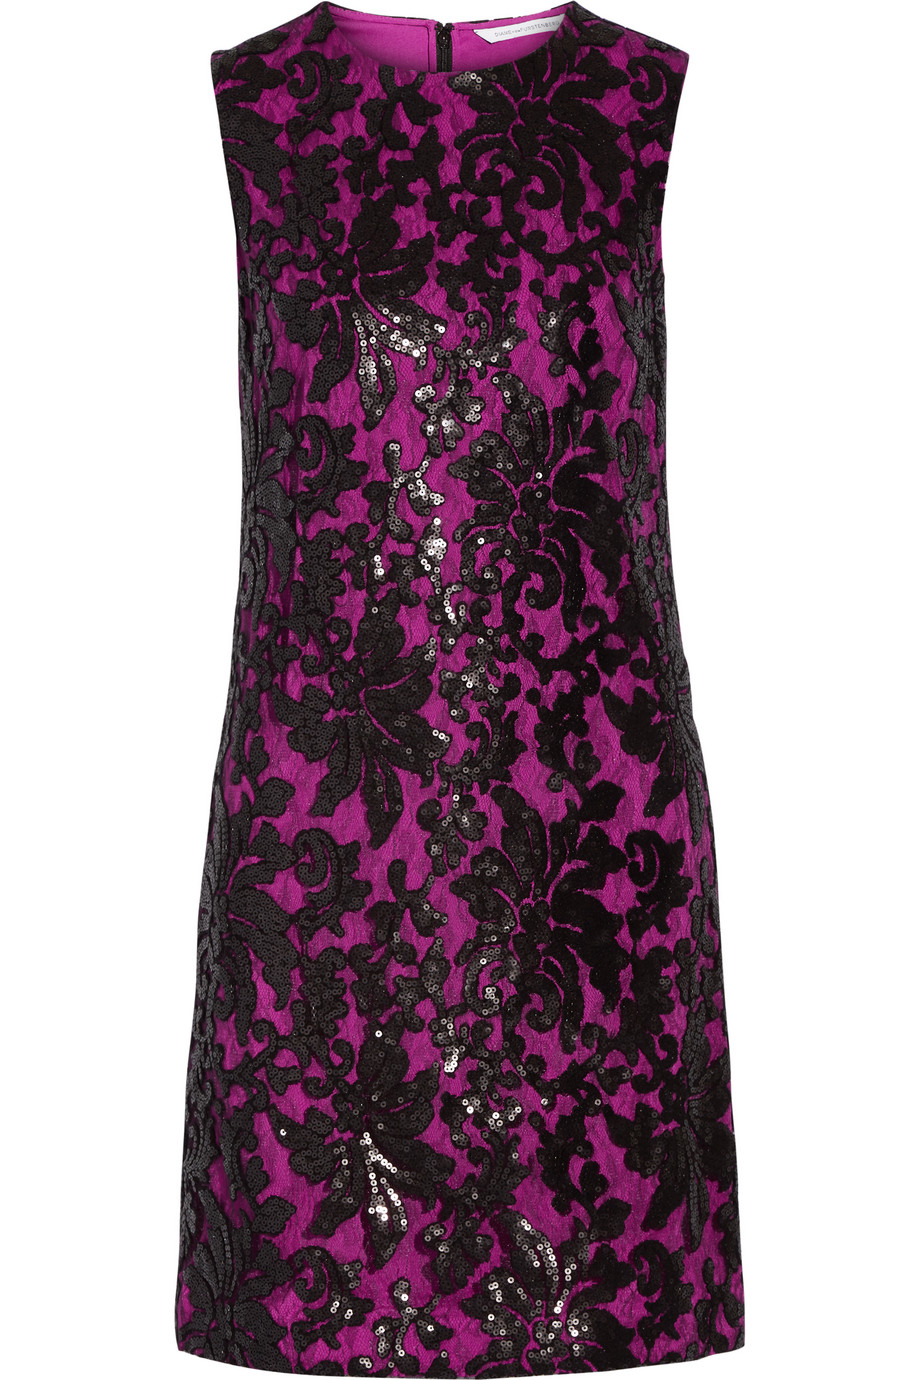 Diane Von Furstenberg Kaleb Sequined Appliquéd Lace and Stretch-Crepe Dress, Fuchsia/Black, Women's - Floral, Size: 14